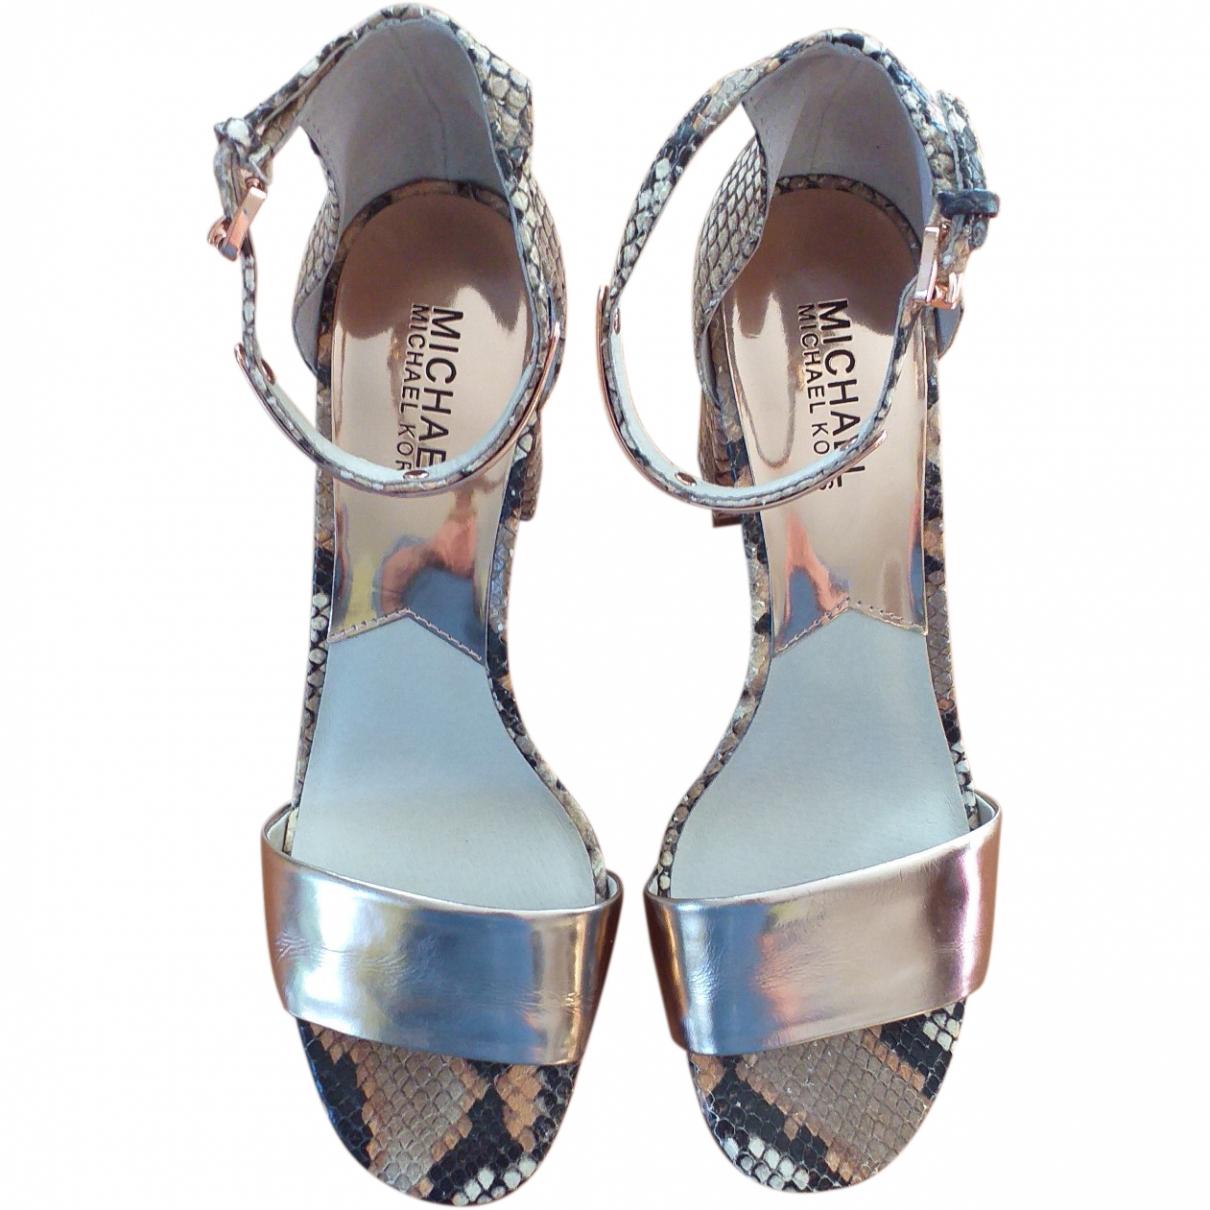 Michael Kors \N Metallic Leather Sandals for Women 38.5 EU